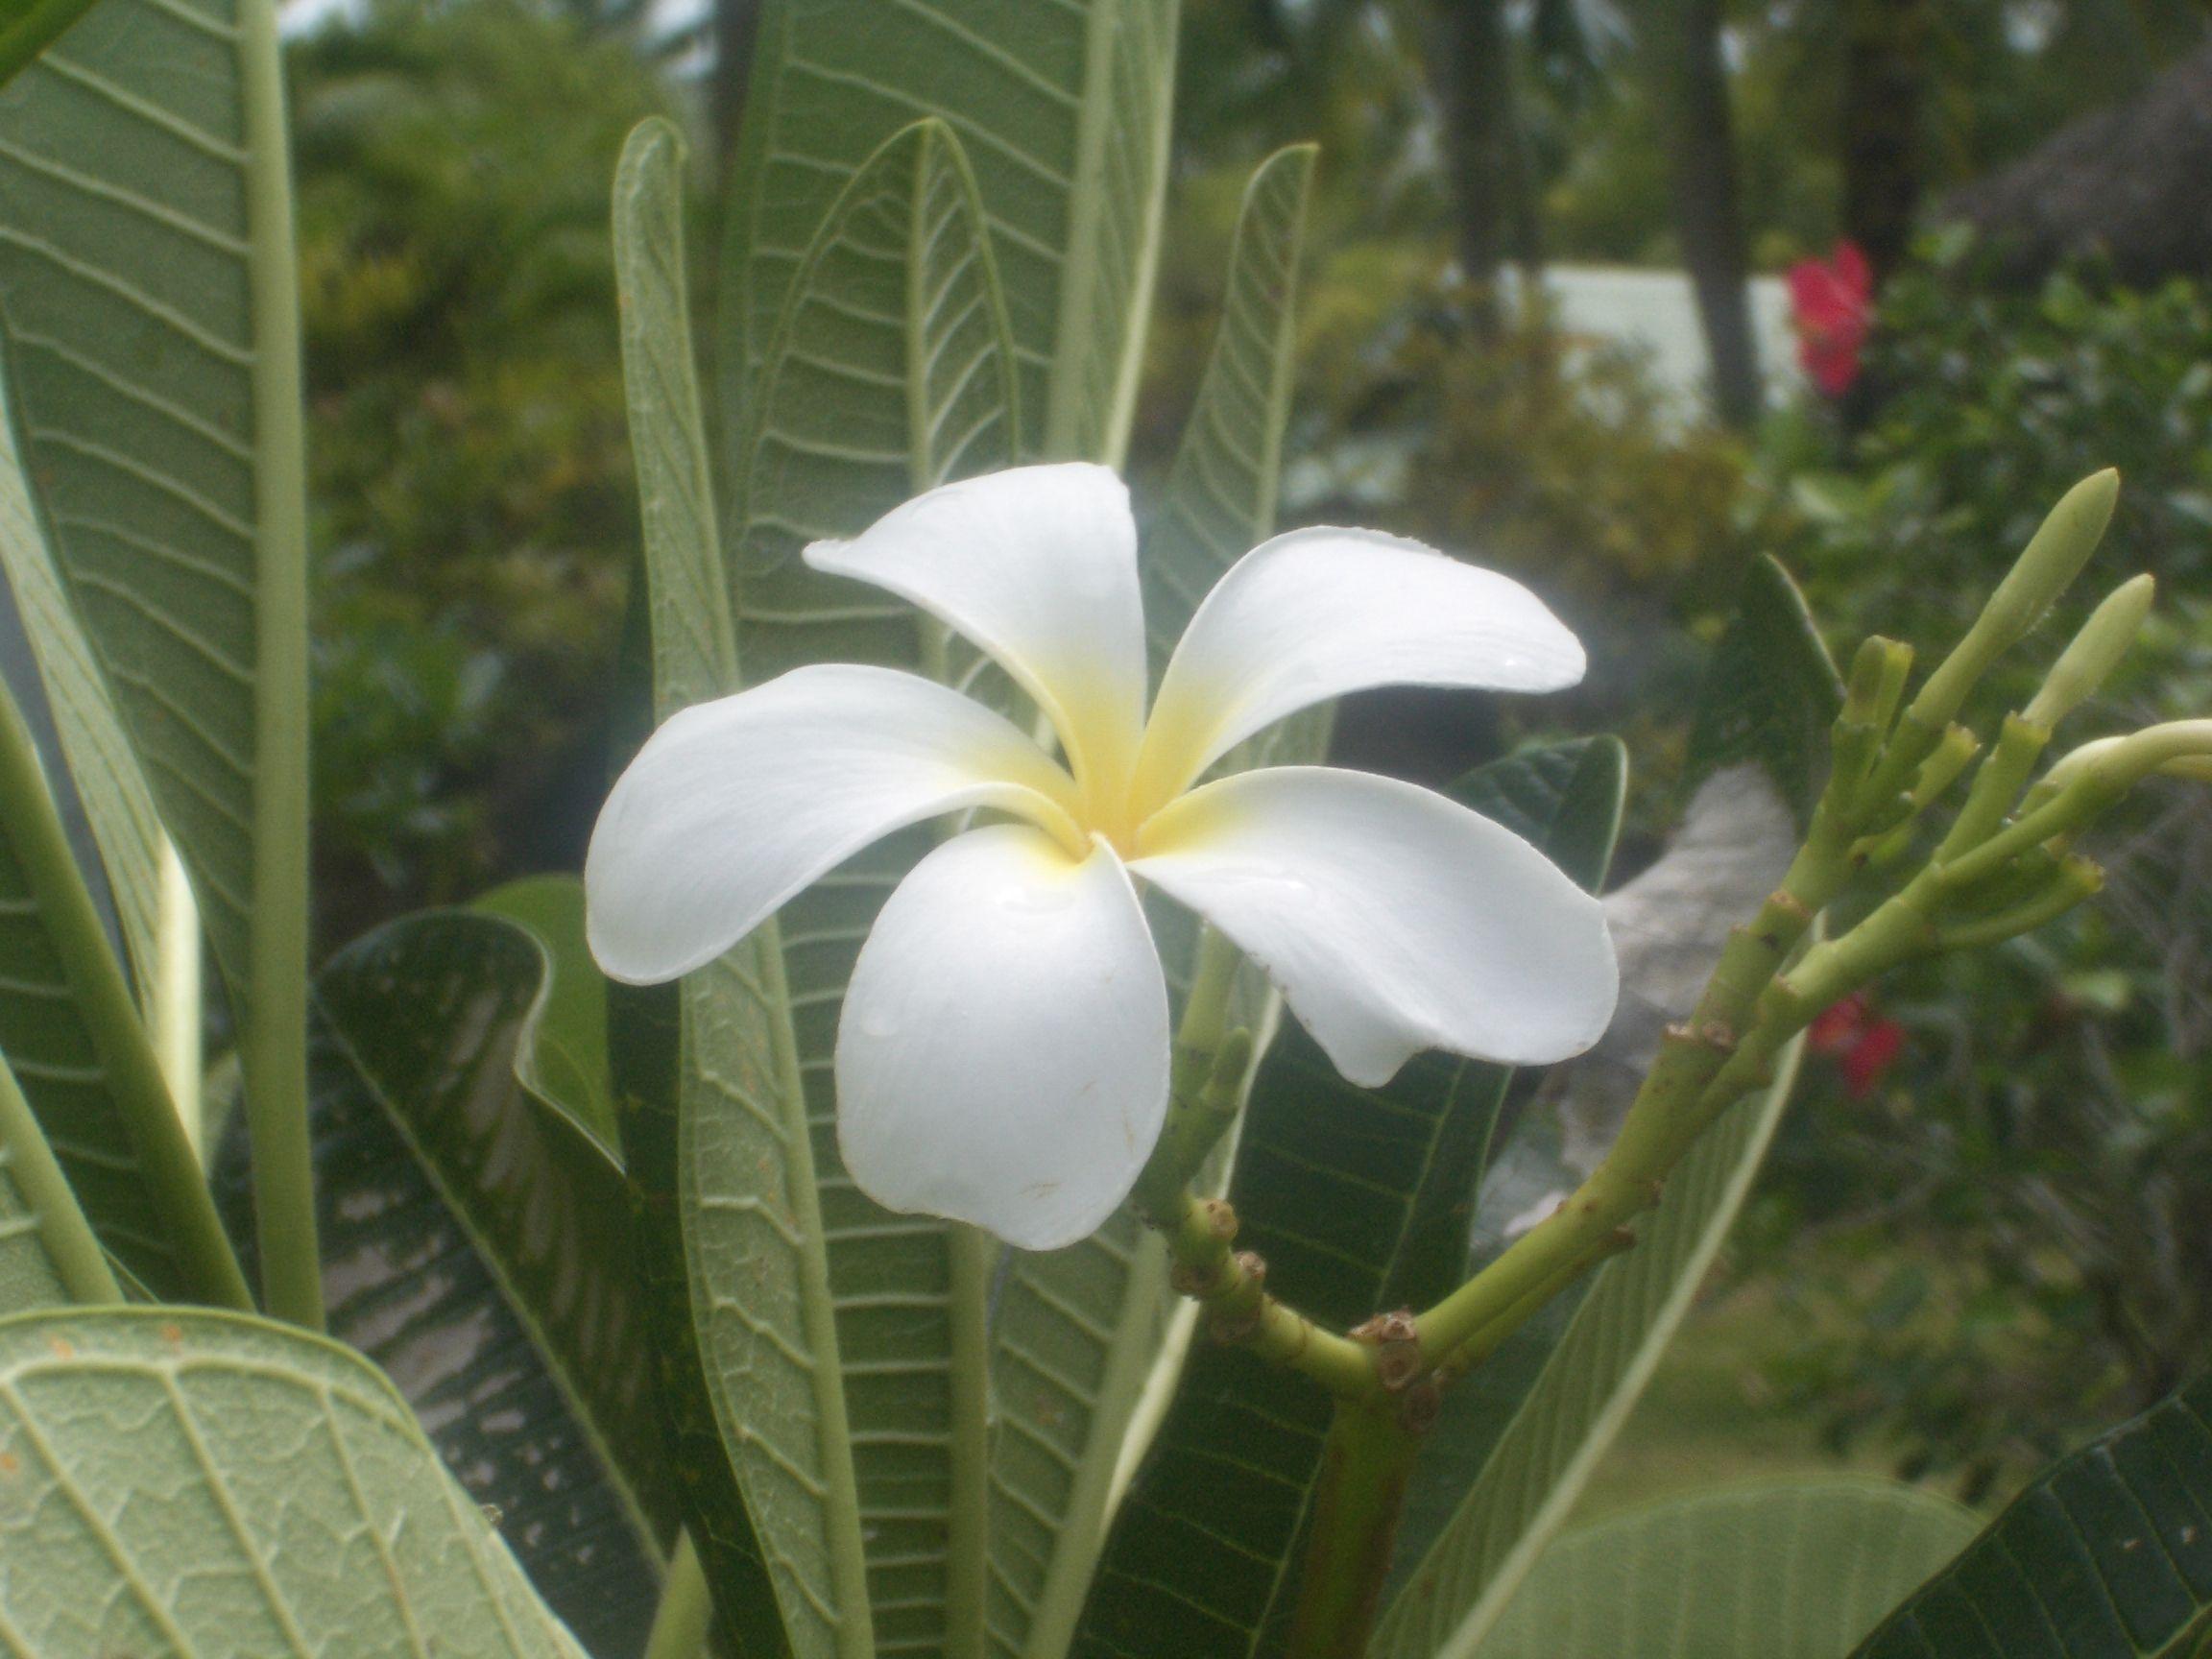 Tiare flower moorea french polynesia flowers pinterest tiare flower moorea french polynesia mightylinksfo